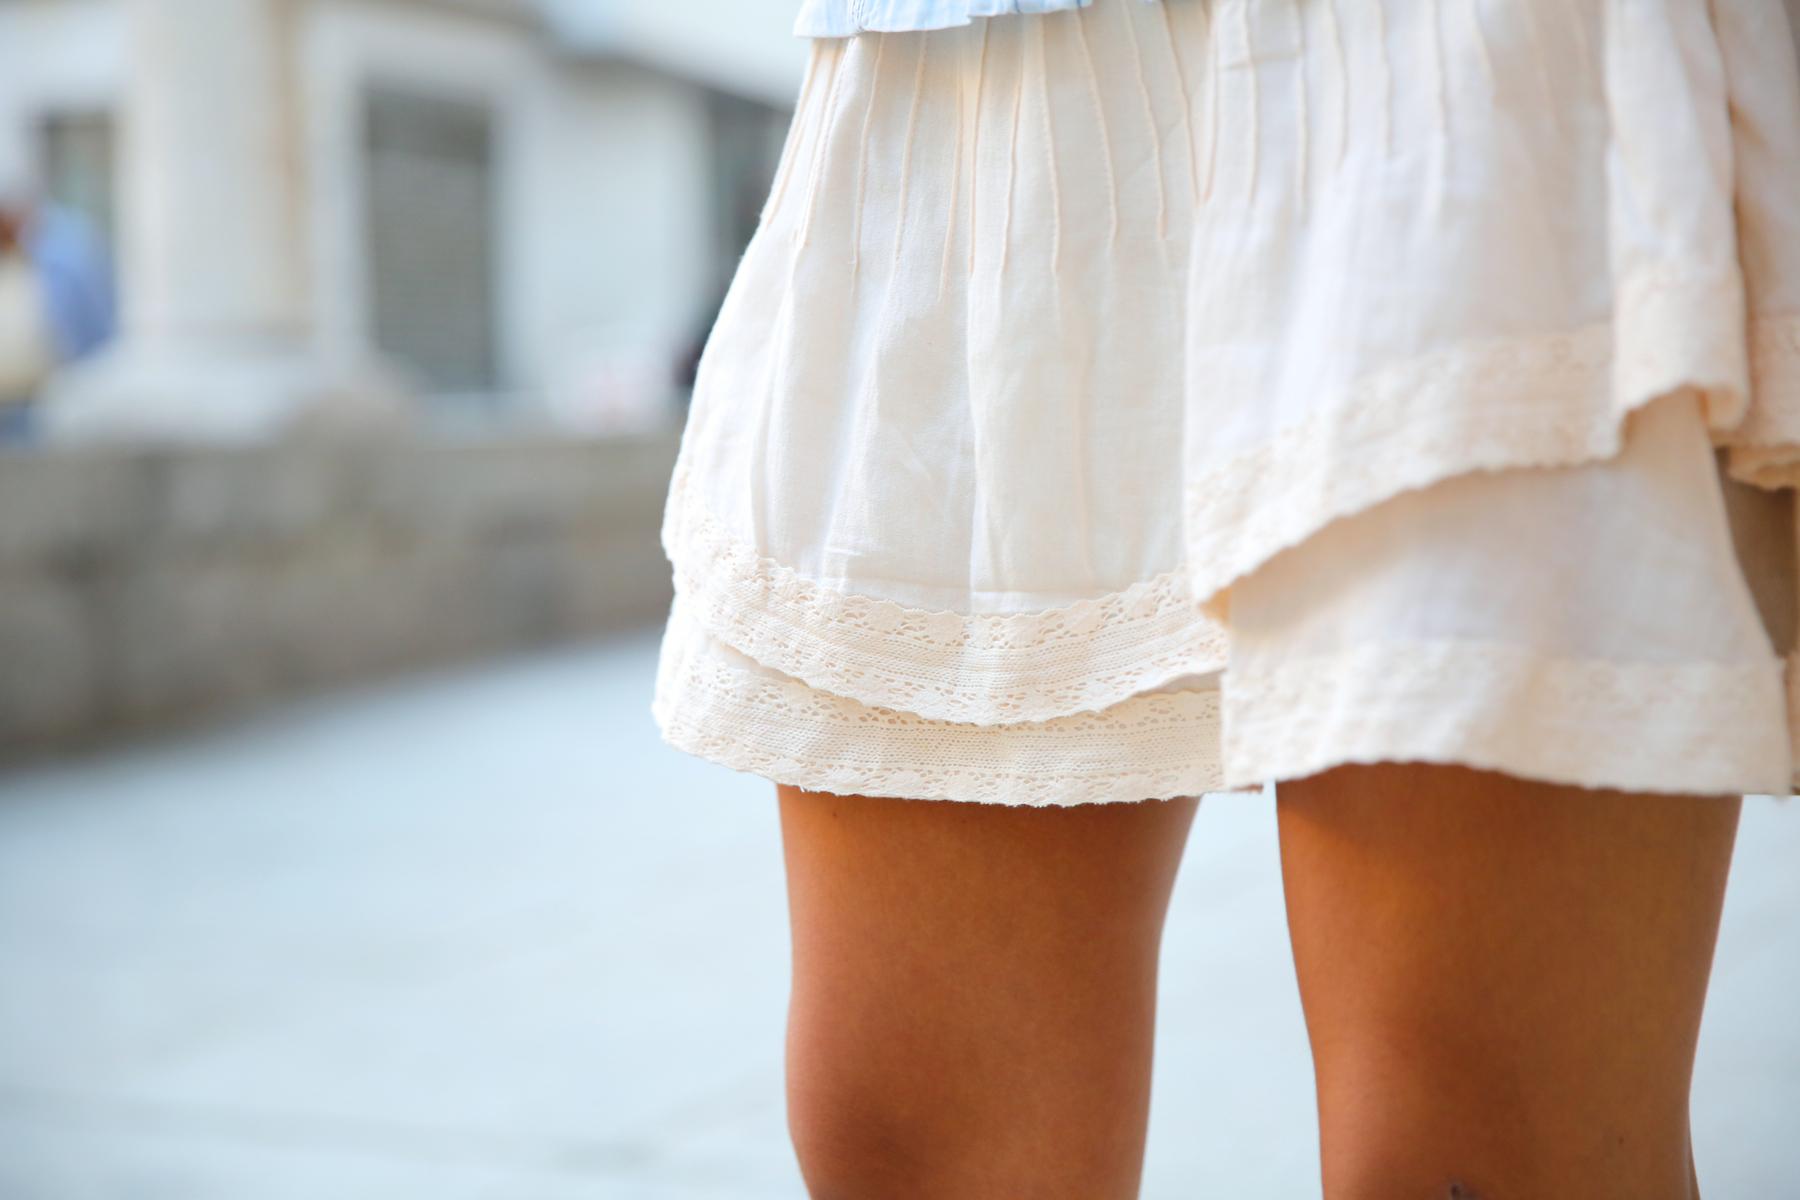 trendy_taste-look-outfit-street_style-denim-blog-blogger-fashion_spain-moda_españa-botines_camperos-it_shoes-cowboy_booties-skirt-falda-bolso_flecos-fringes_bag-camisa_vaquera-denim_shirt-3